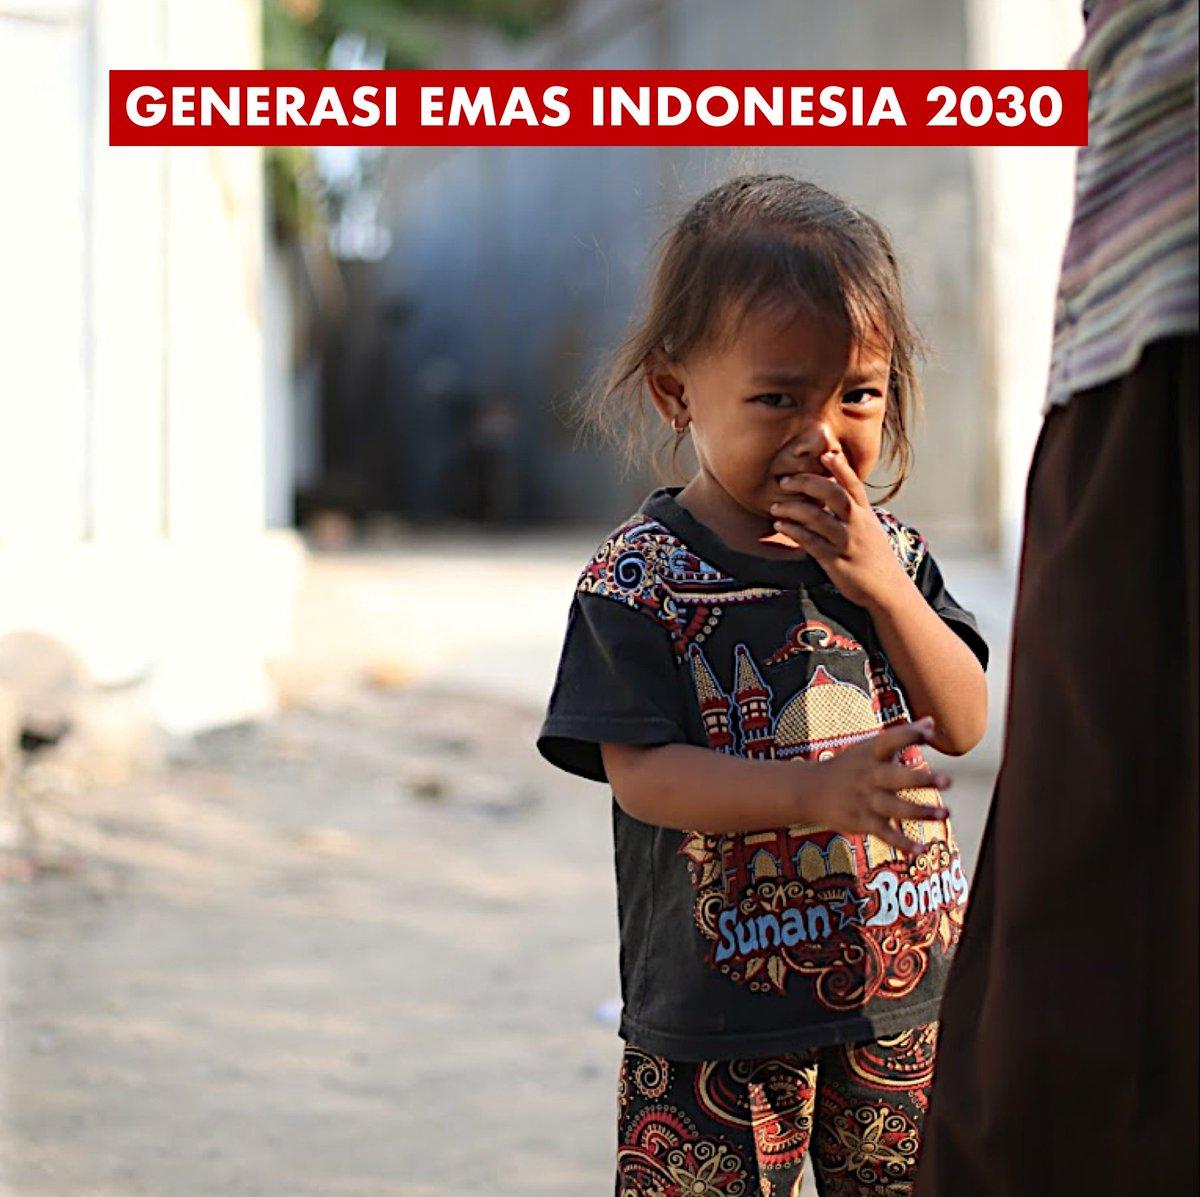 Kita dengar ttg bonus demografi Indonesia 2020-2030. Bonus demografi mengandung makna jumlah usia-produktif 15-64 tahun akan mencapai 70%. Ini merupakan masa2 keemasan Indonesia melakukan percepatan  terutama sektor ekonomi. Di pundak mereka kita letakkan harapan kita bersama https://t.co/nbeDjloPHe